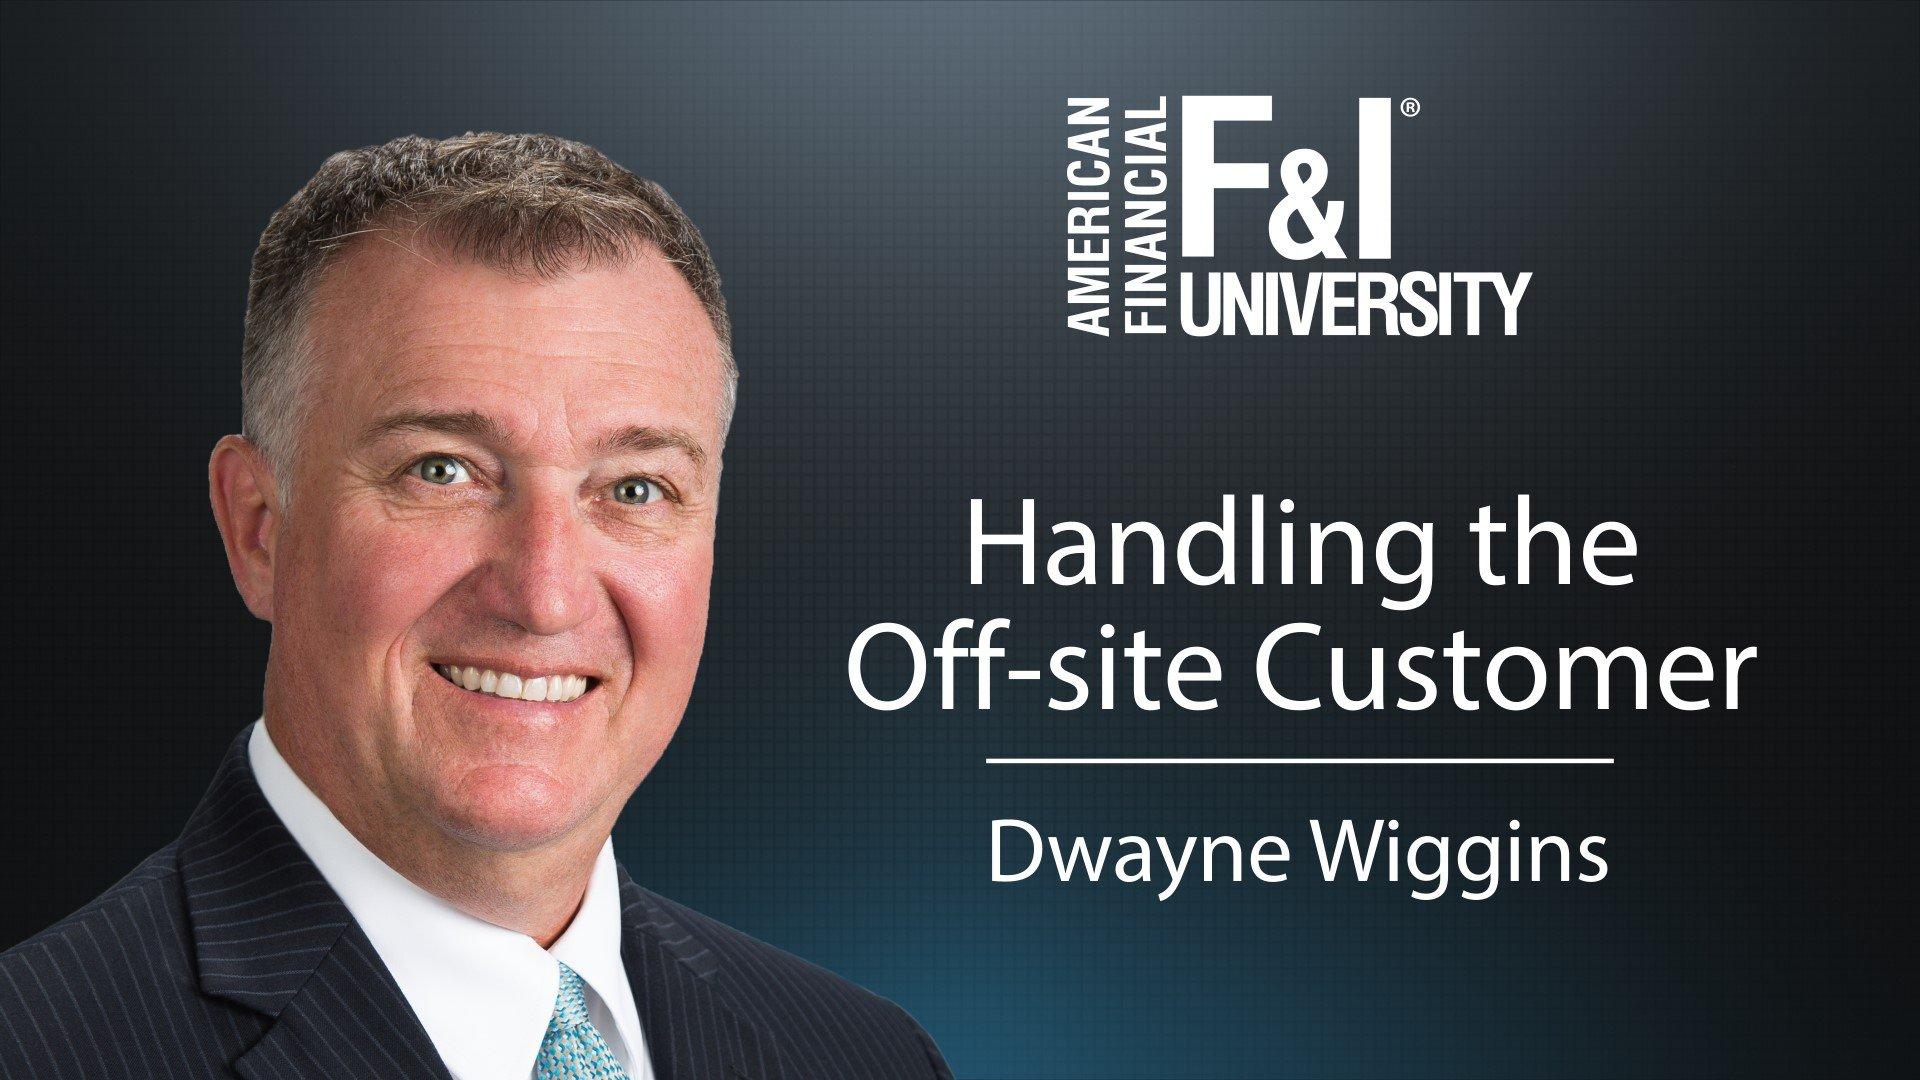 Handling the Off-Site Customer